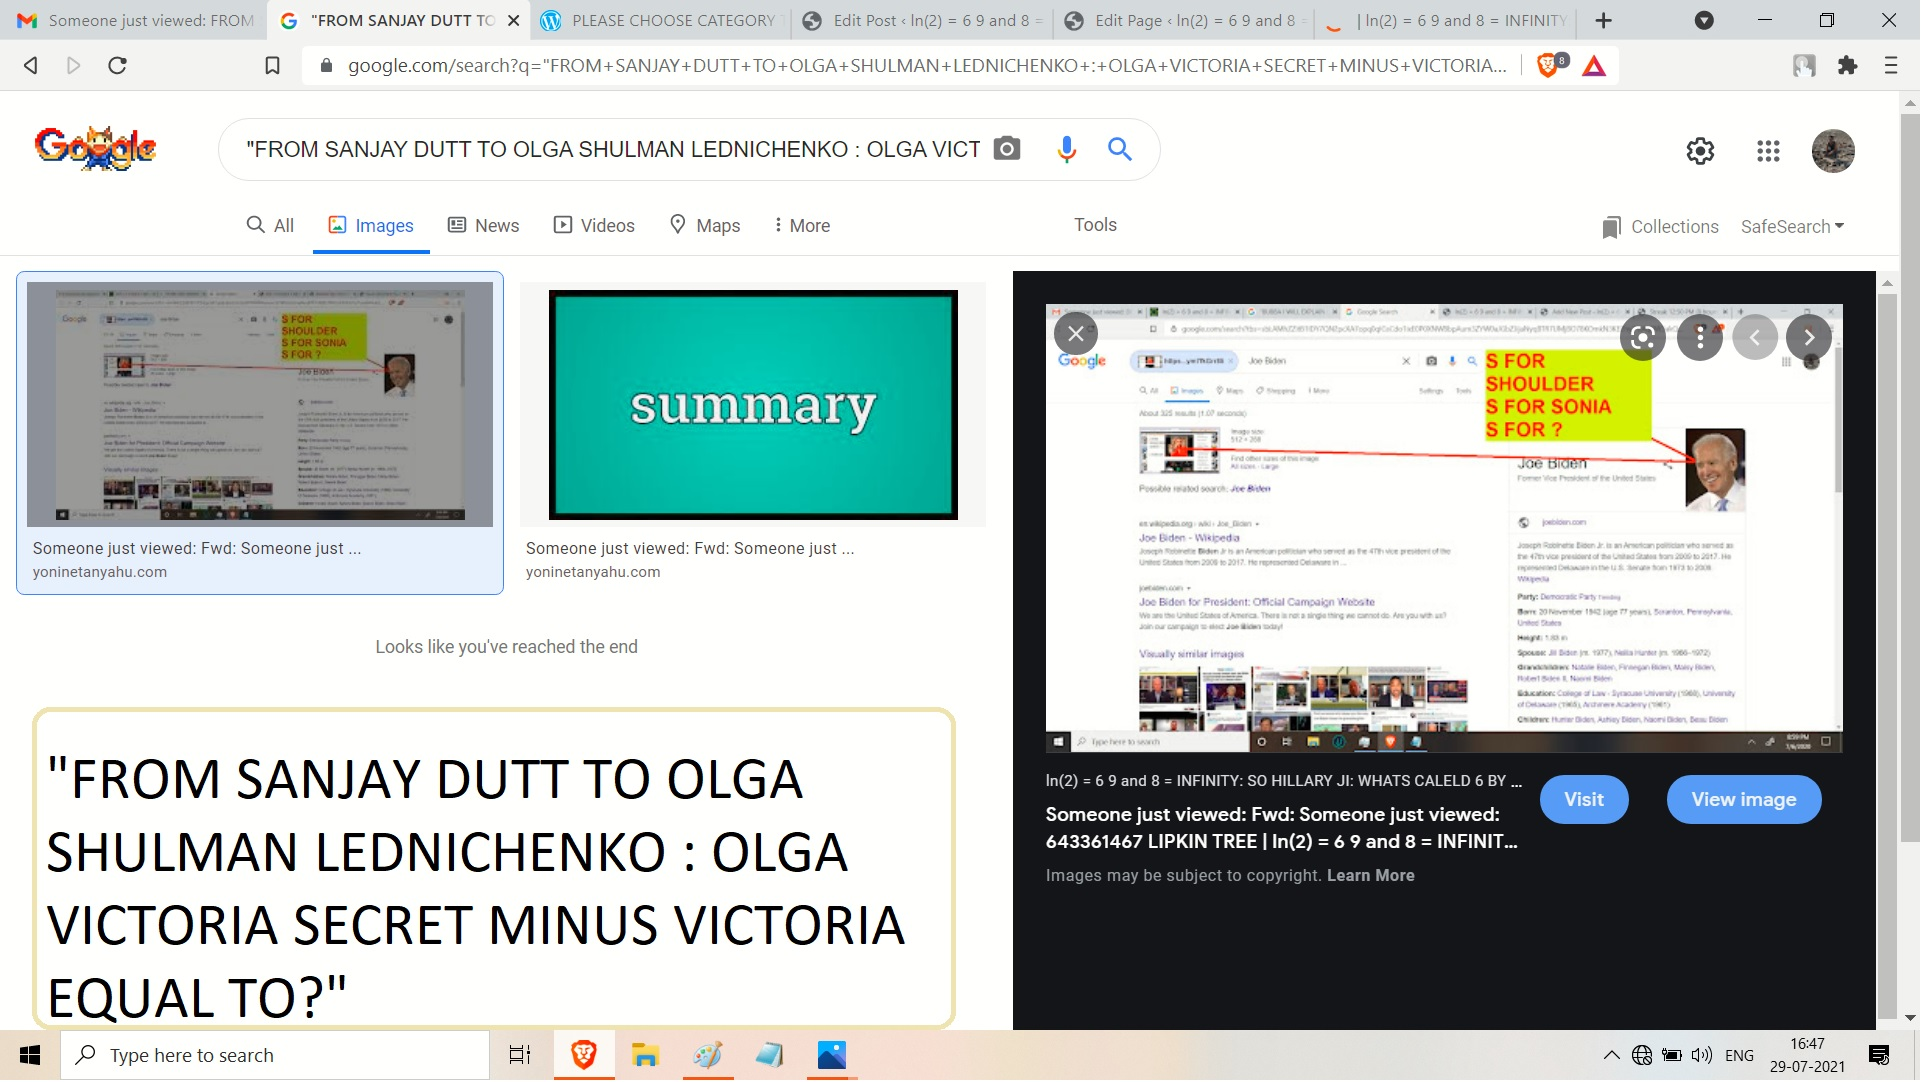 VICTORAI SECRETS ALINA MATSENKO ADN AJAY MISHRA ADN JOE BIDEN